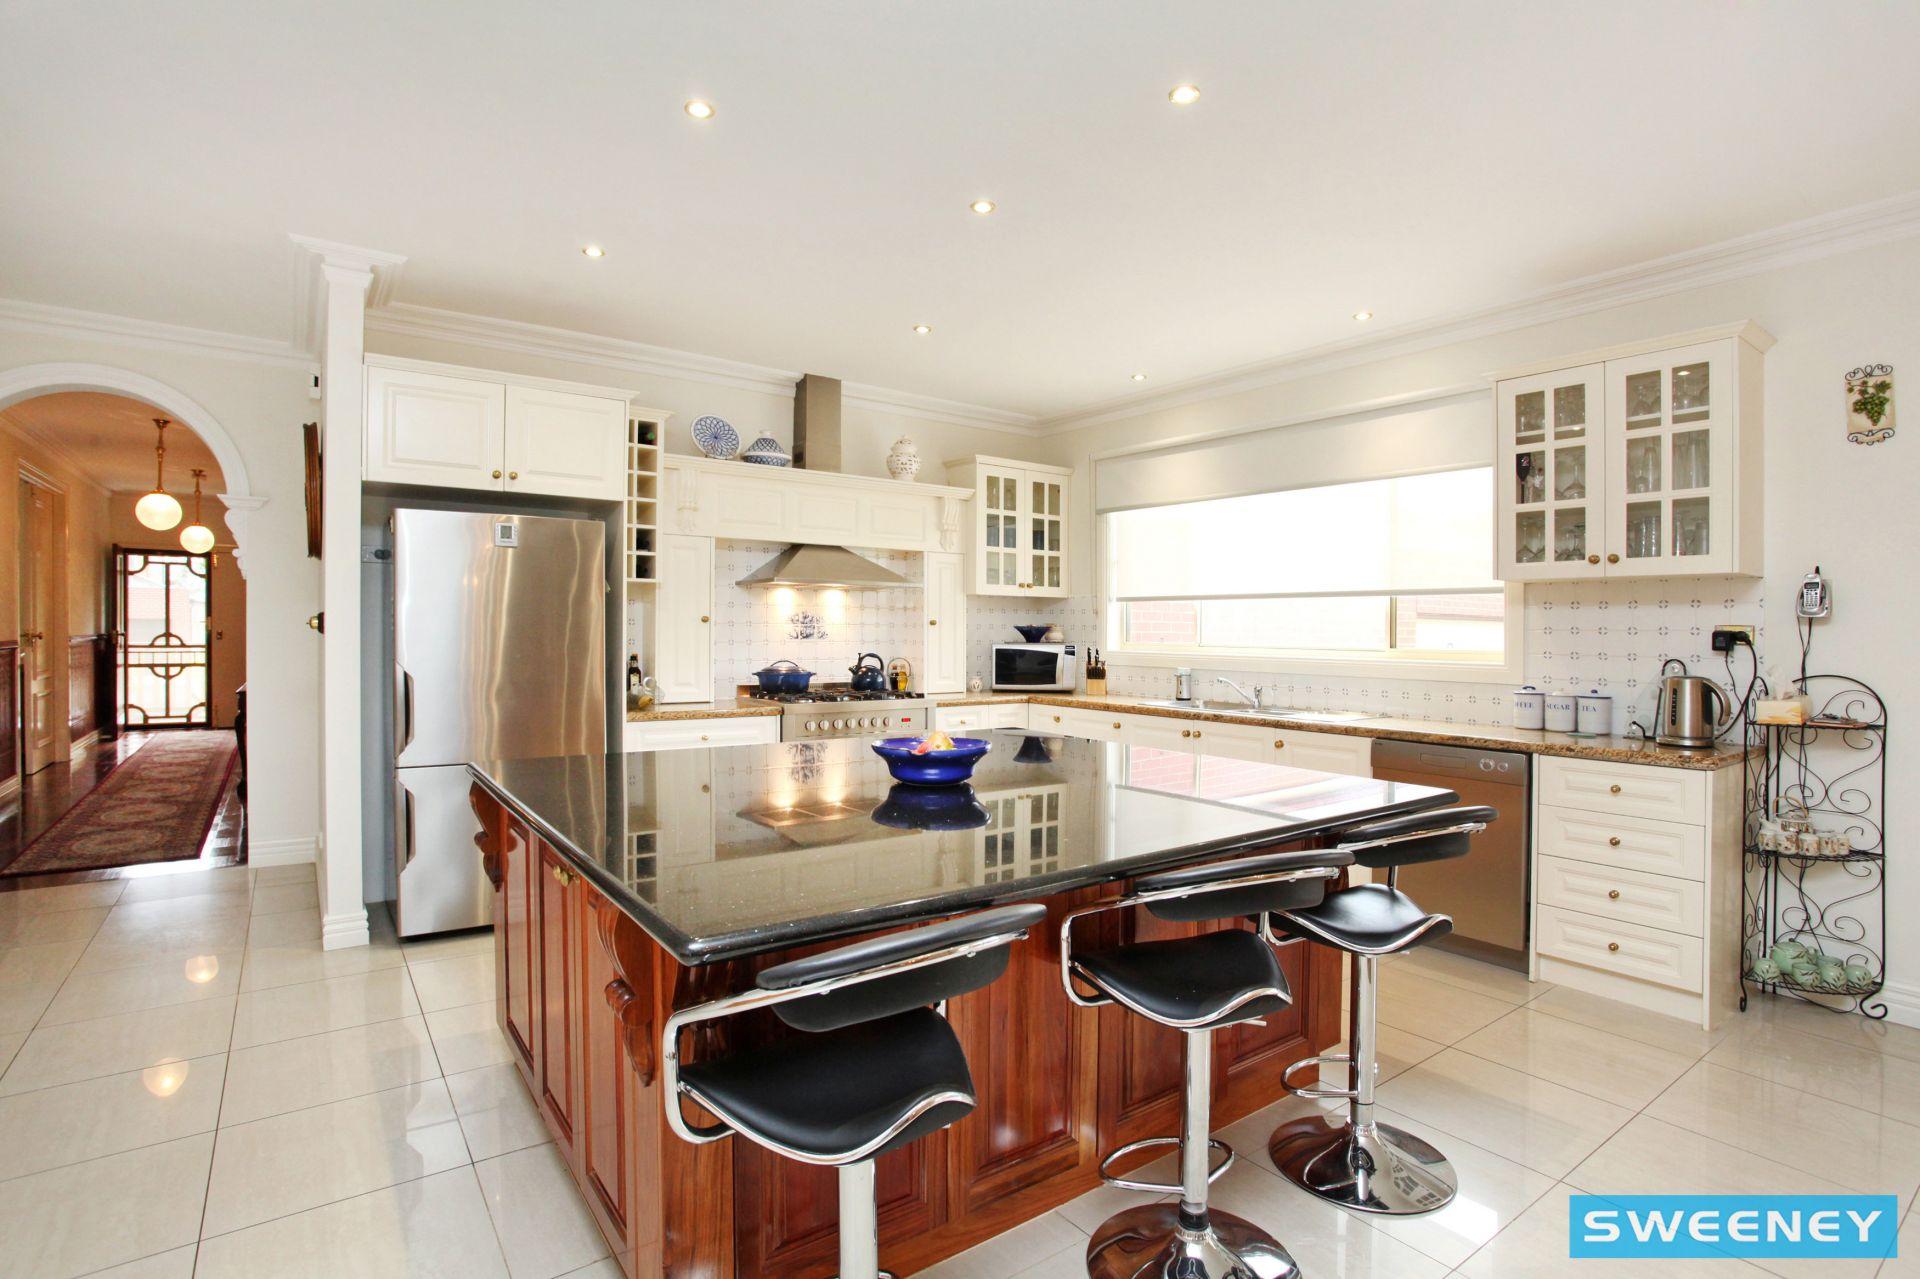 Real Estate For Sale - 1 Barlow Close - Caroline Springs , VIC